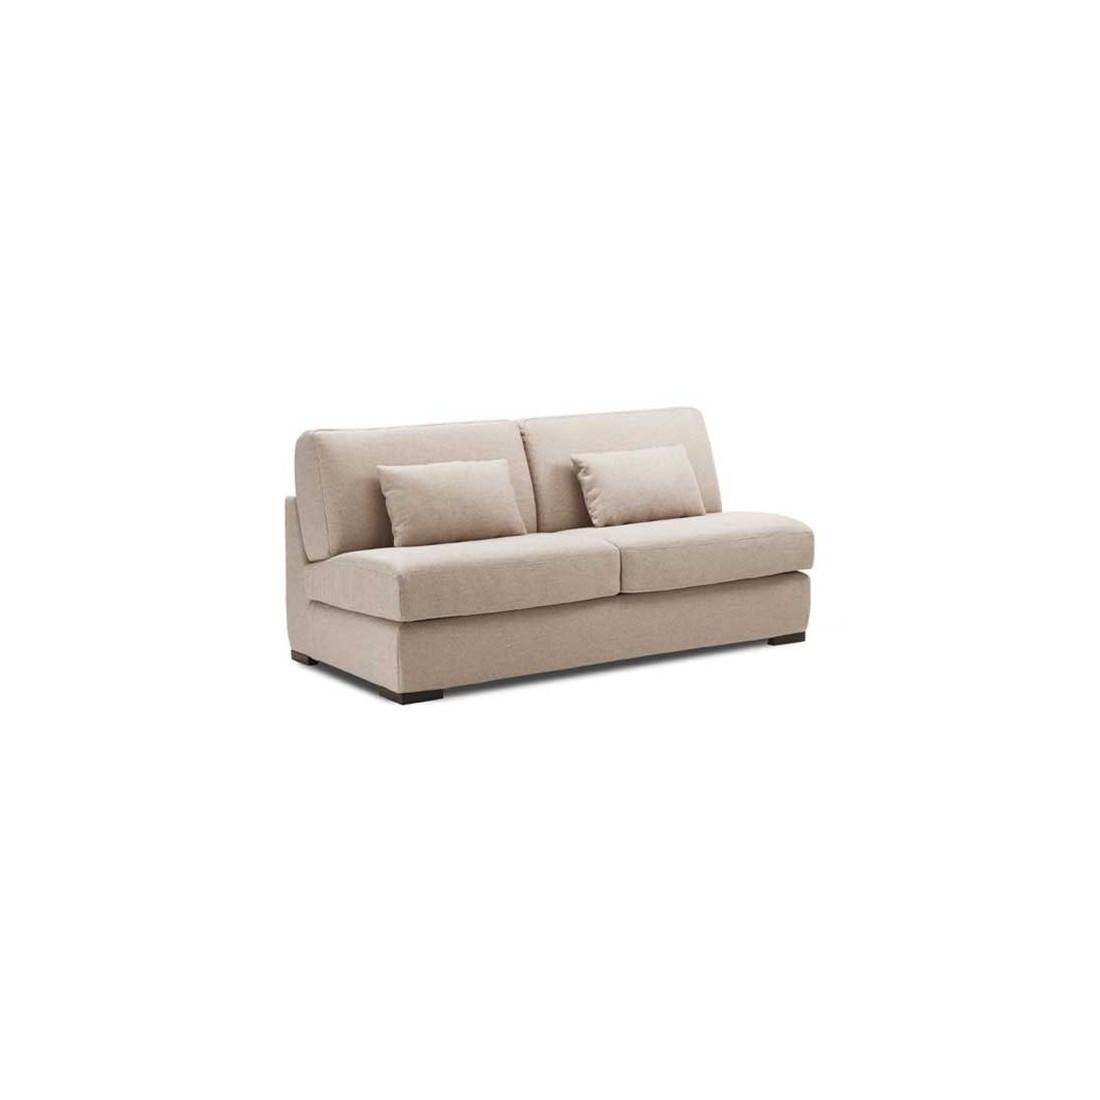 canape convertible confortable canape convertible relax lit confort luxe salon en cuir ou. Black Bedroom Furniture Sets. Home Design Ideas